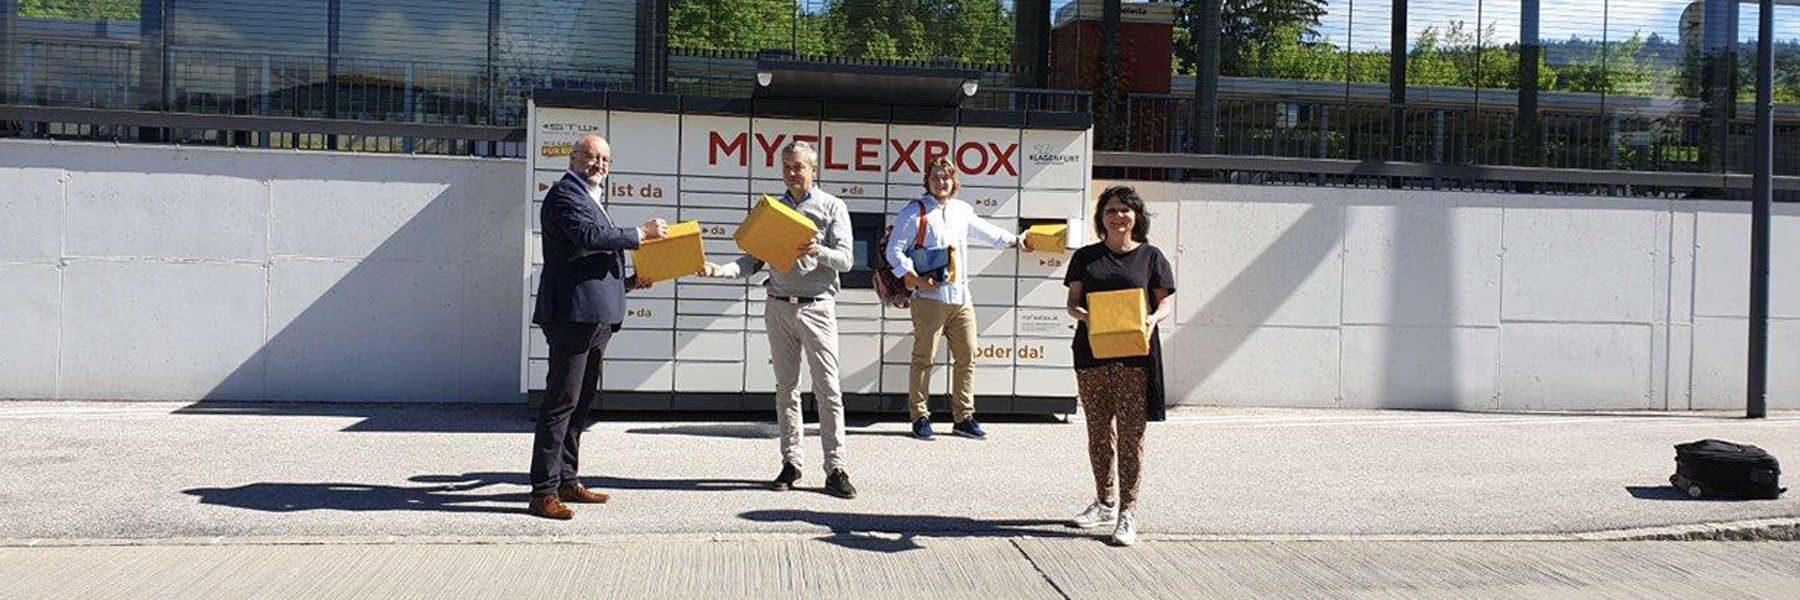 STW myflexbox